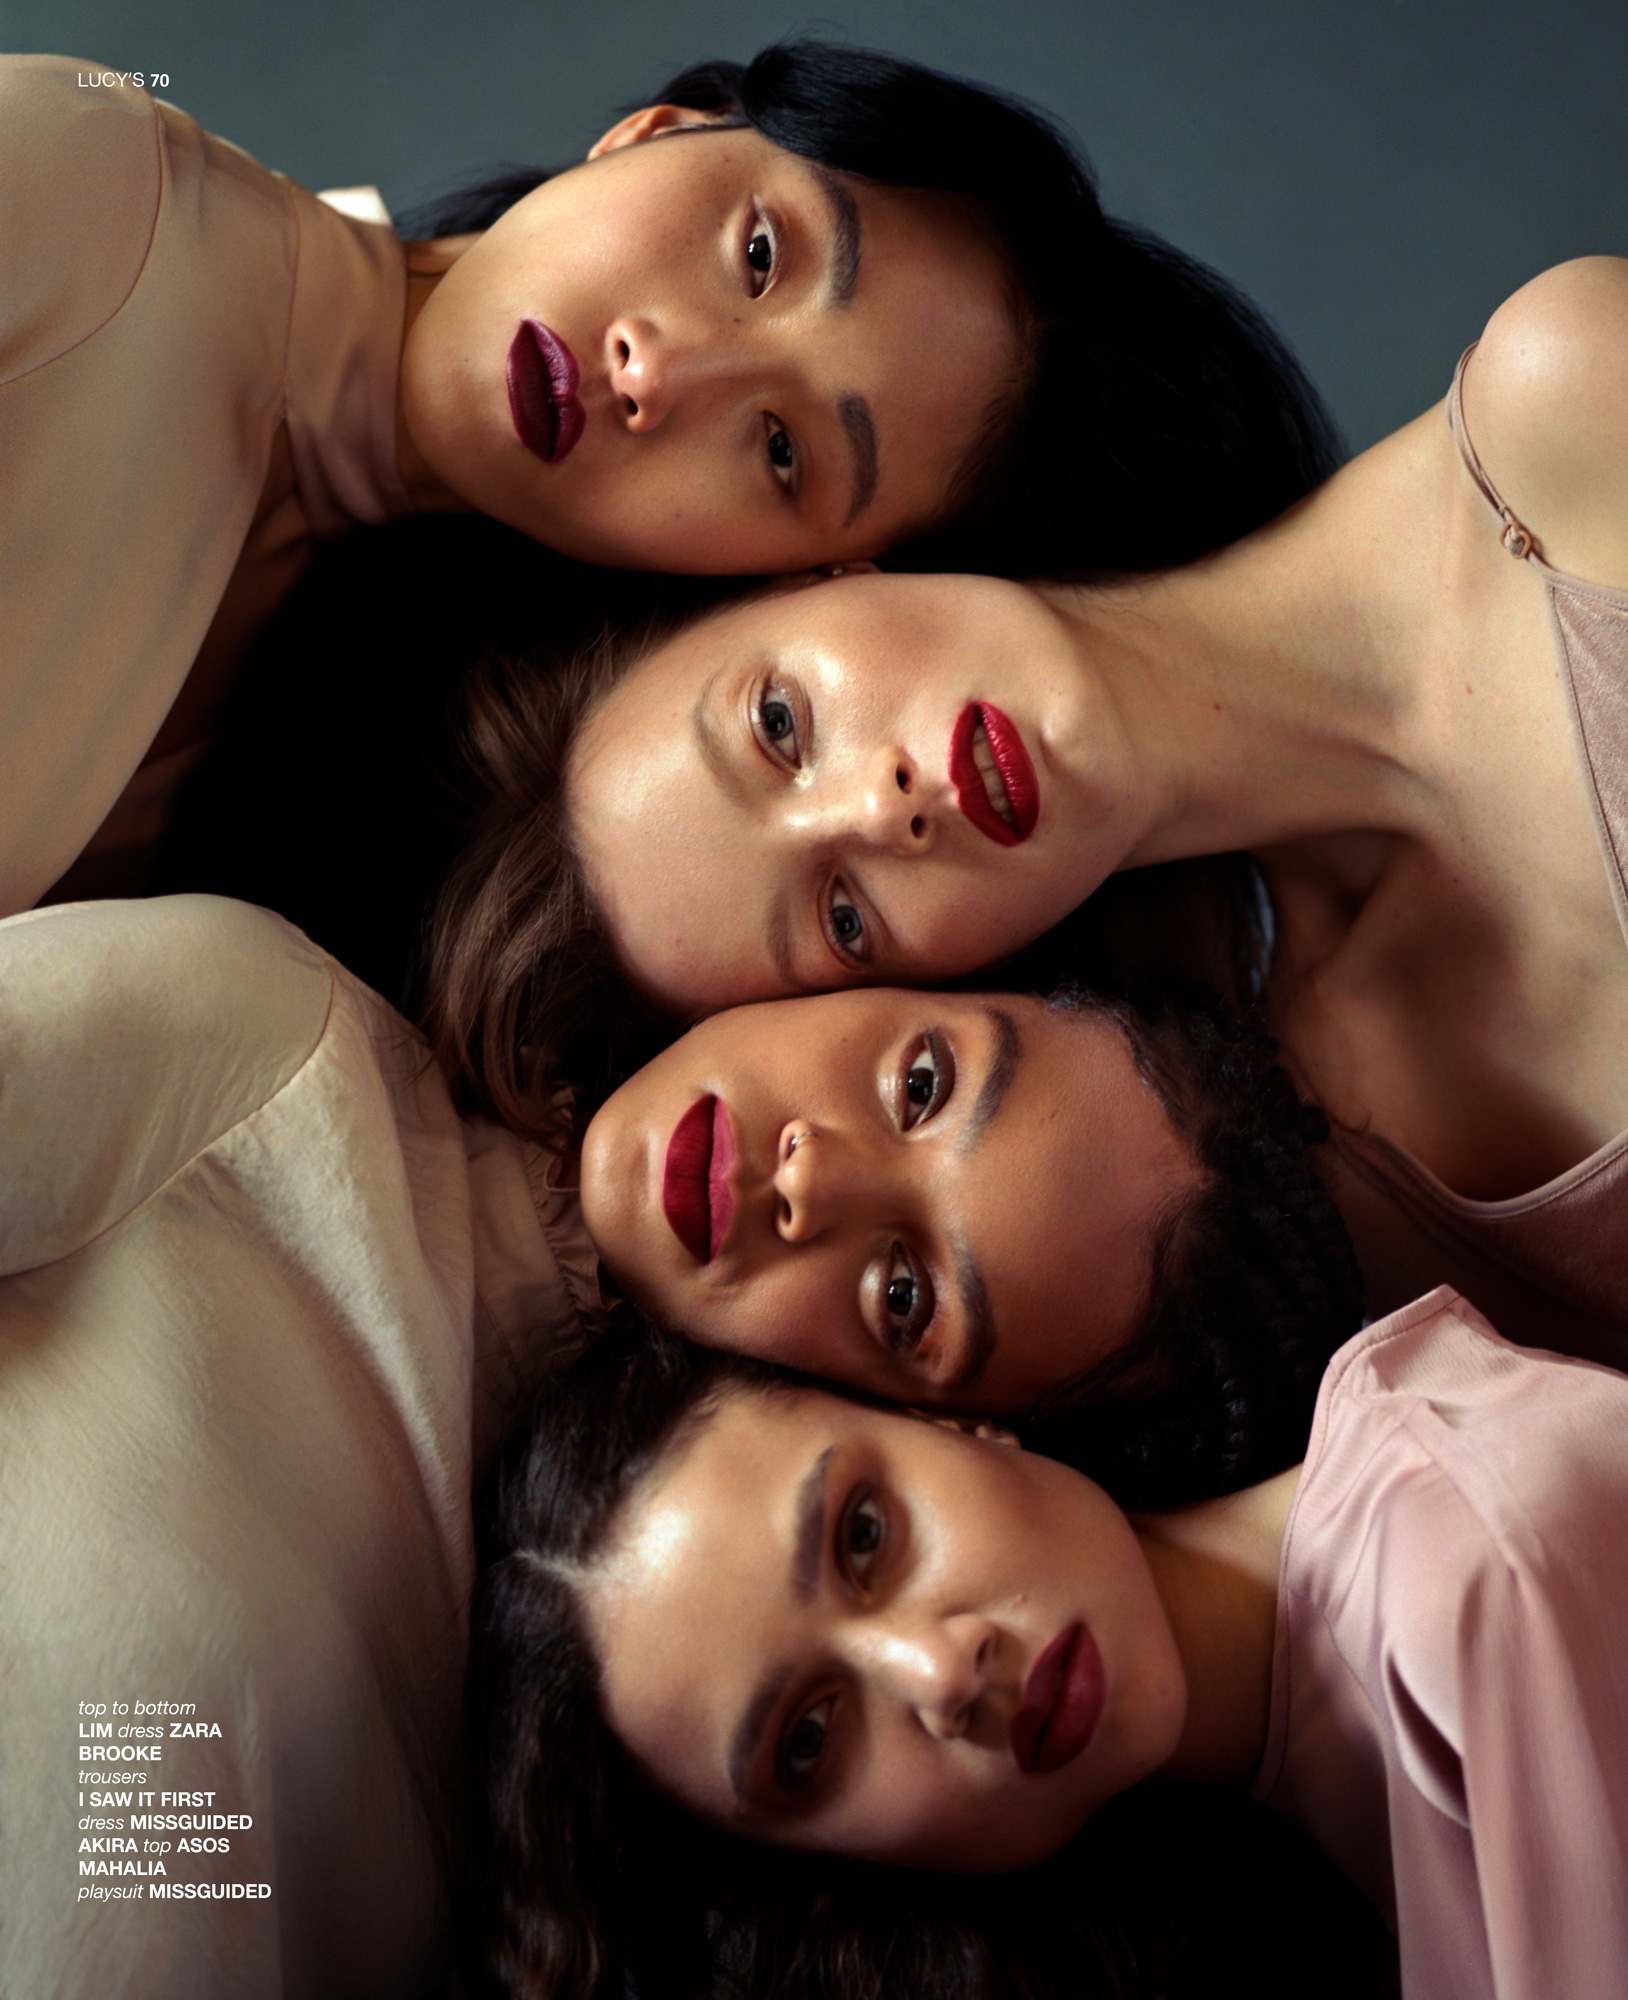 Shades Of Beauty, story for Lucys Magazine, Photography By Ioannis Koussertari. Featuring Lim Lee, Akira Reid, Mahalia Mensah and Brooke Madsen.